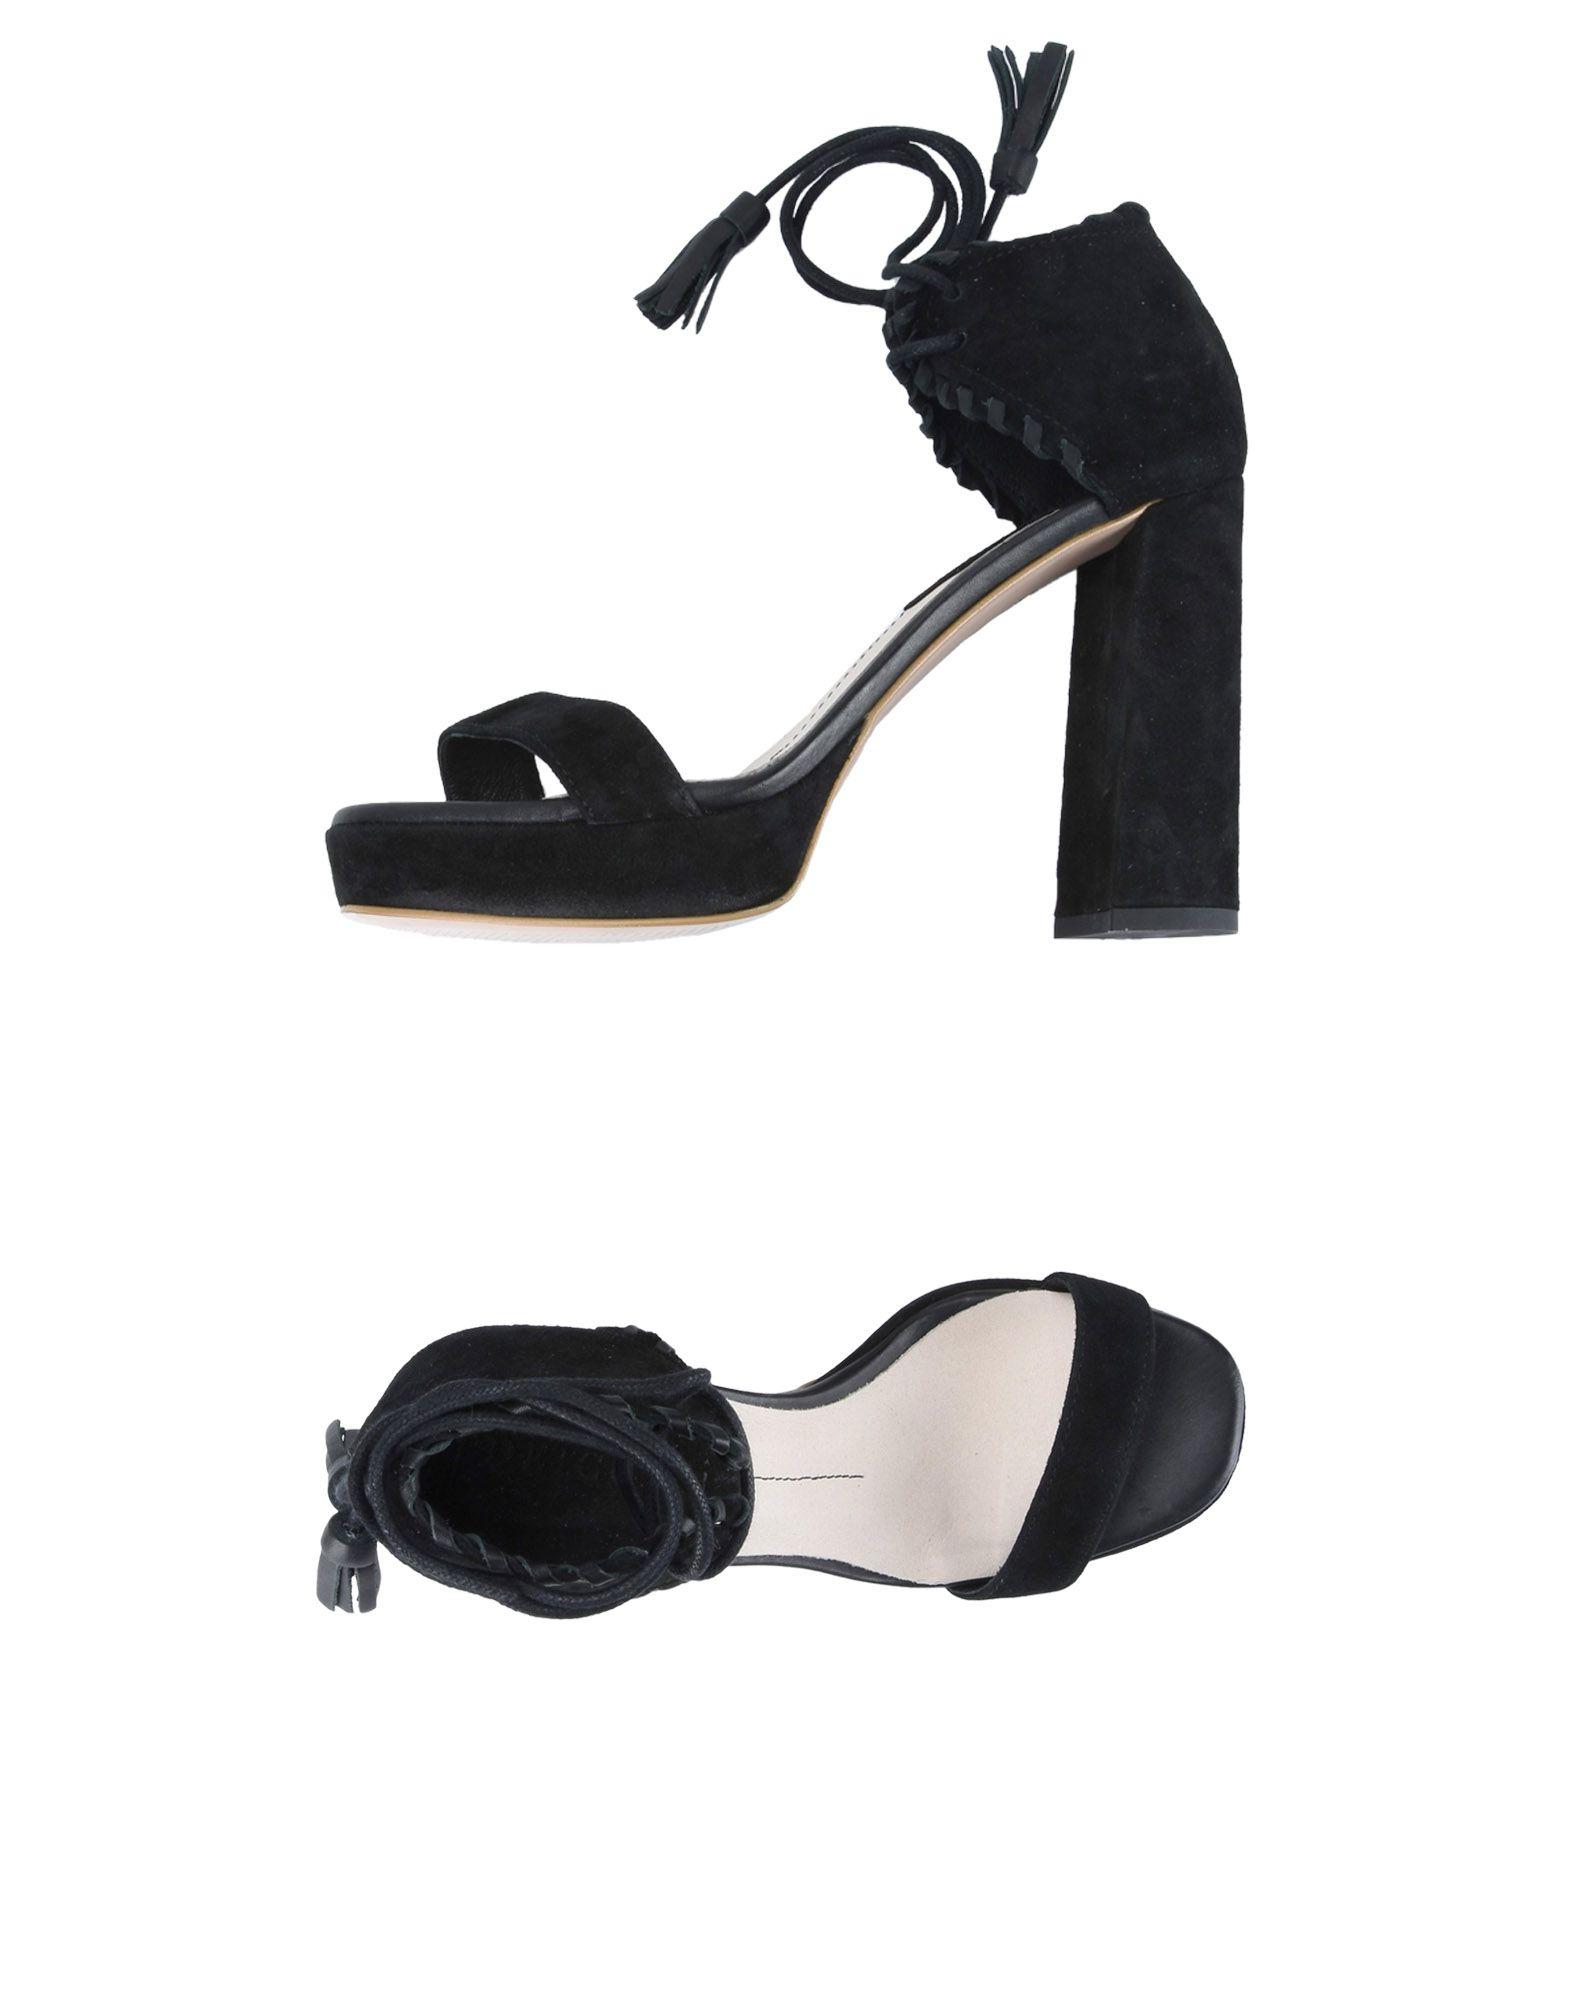 Fabbrica Deicolli Sandalen Damen  11390745IA Gute Qualität beliebte Schuhe